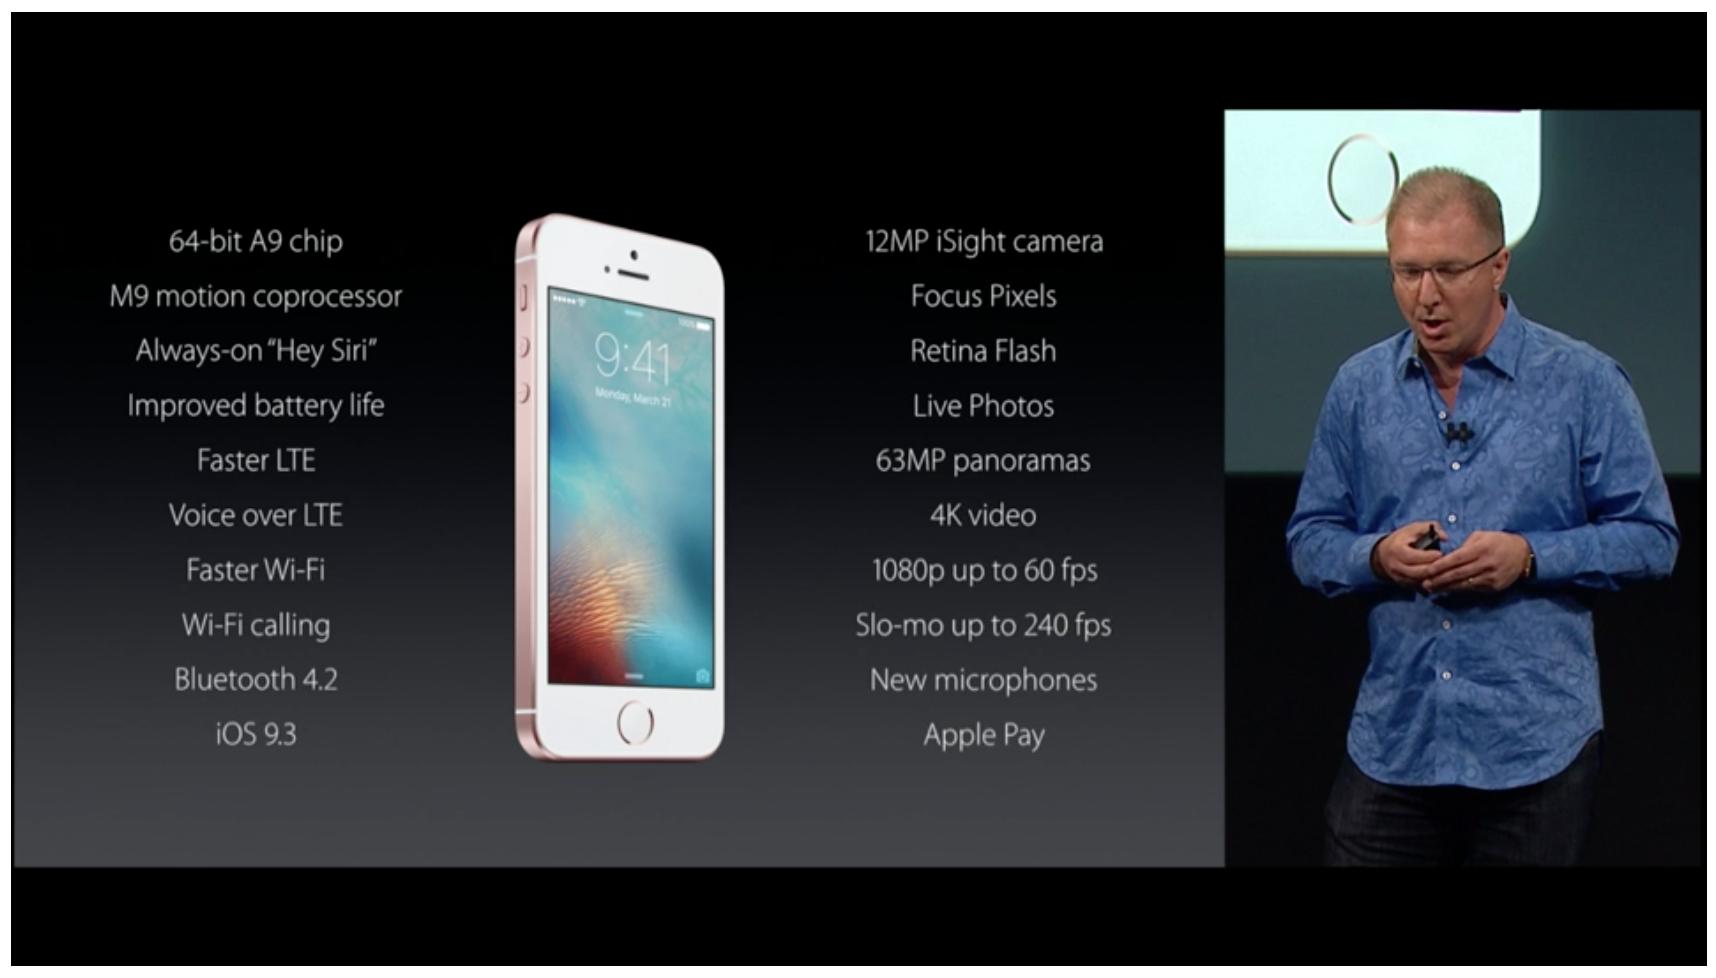 Apple iPhone SE 64 GB Unlocked, Space Gray (Certified M: Apple iPhone SE Unlocked Phone -16 GB Retail IPhone SE - Colors, Price & Accessories Verizon Wireless